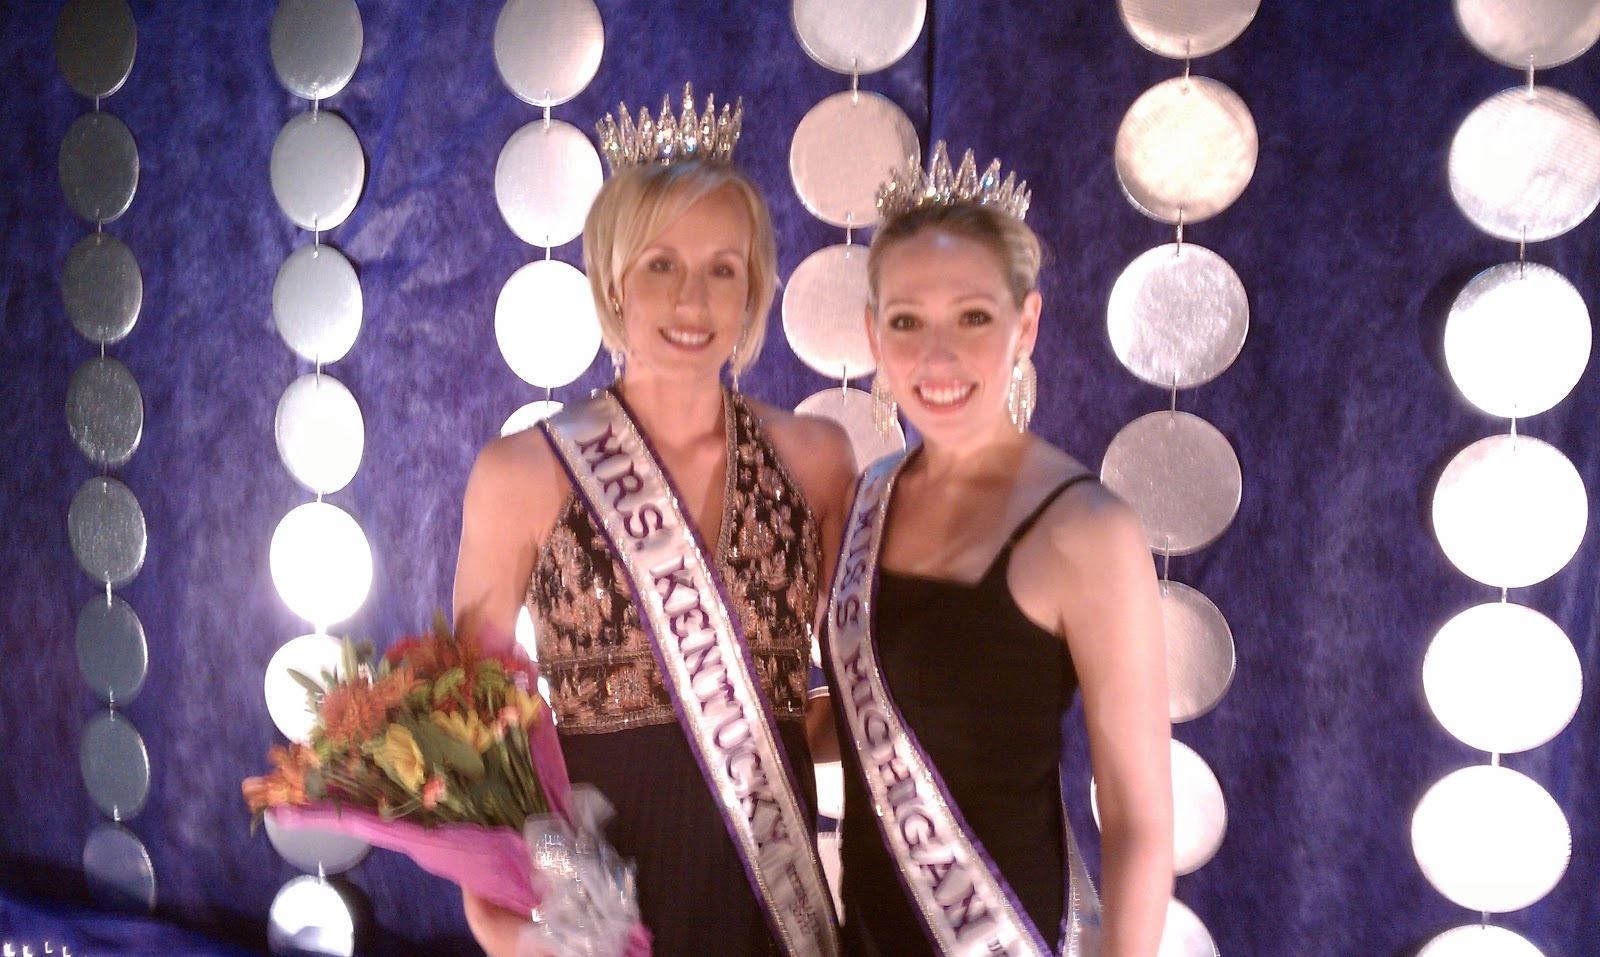 Miss Michigan International 2012: Mrs Kentucky International